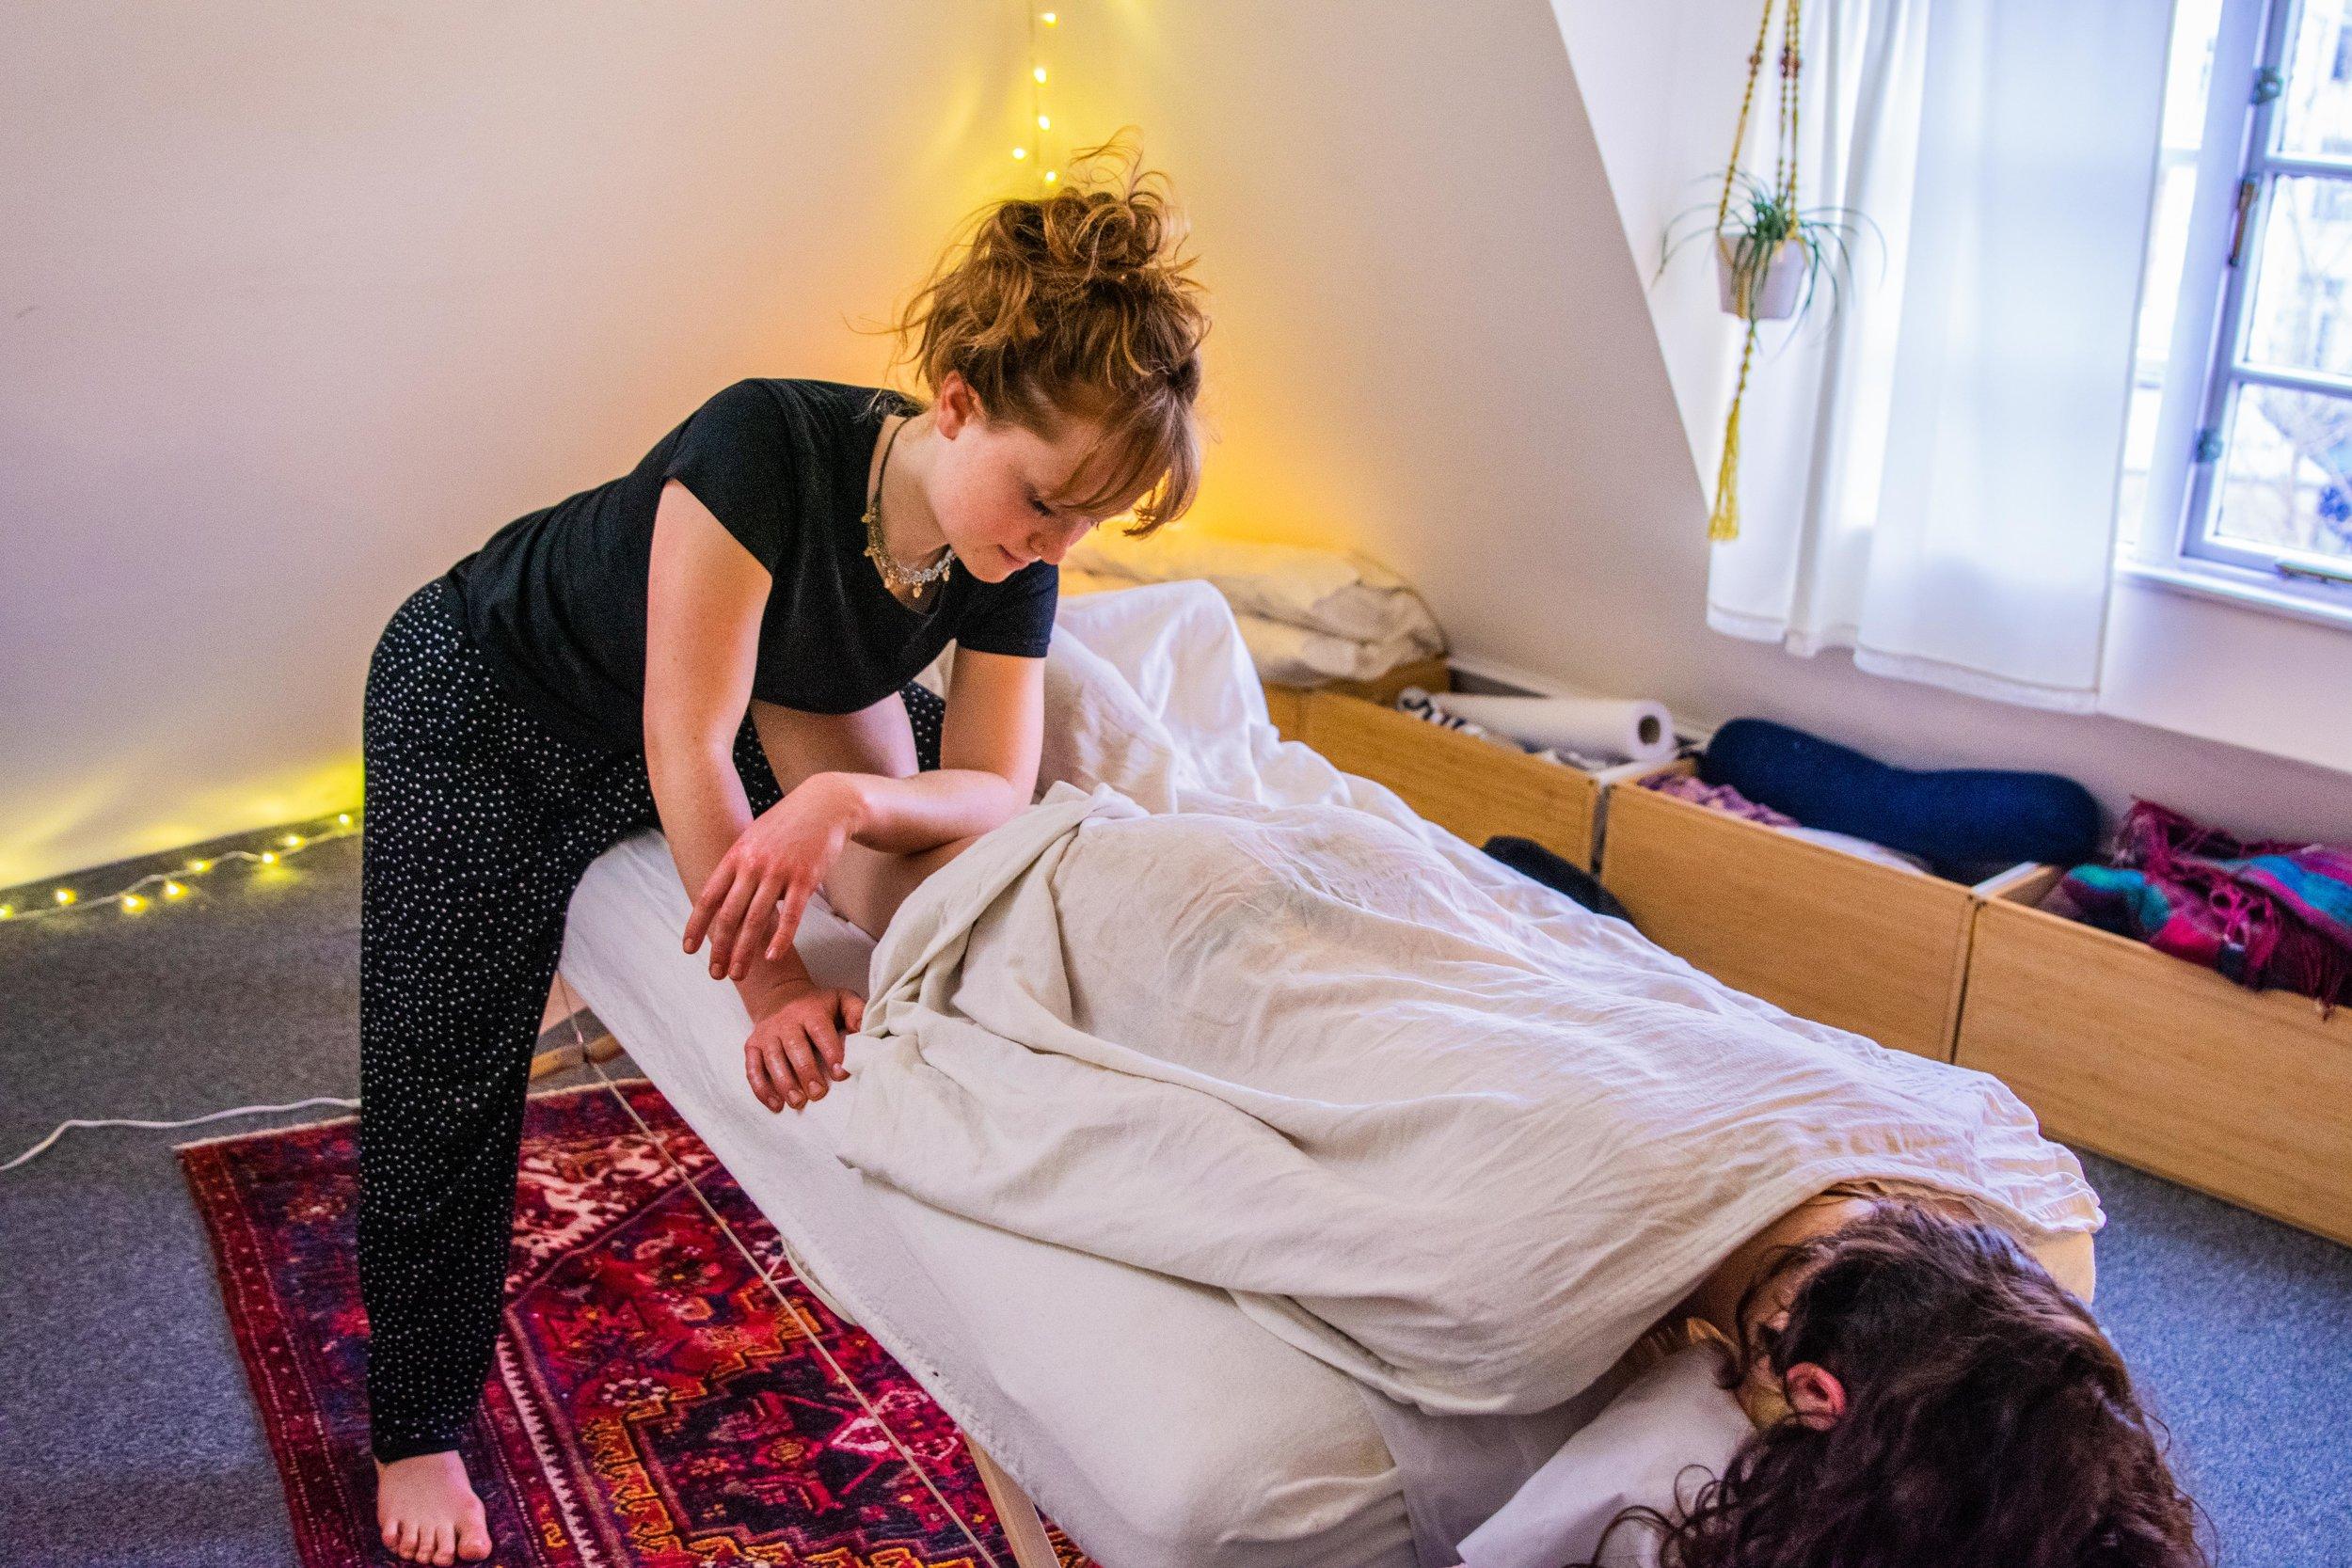 Imogen Quilley, Holistic & Remedial Massage Therapist © Alexa Ledecky-38.jpg